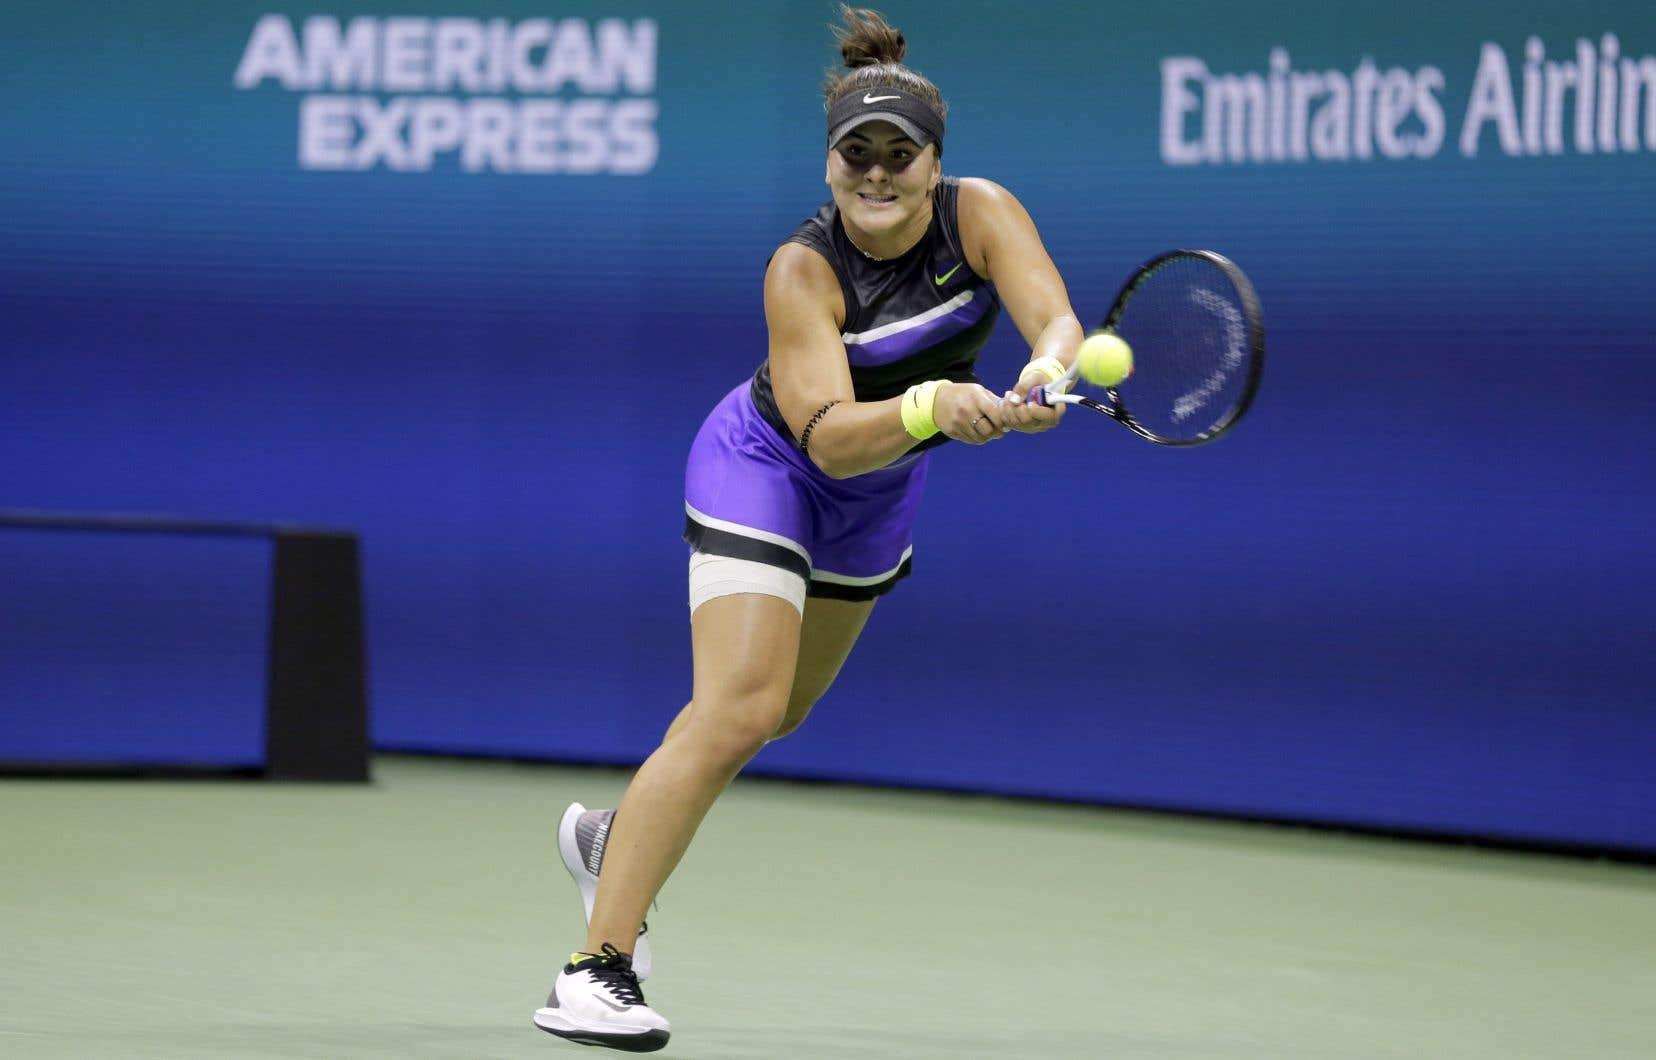 L'Ontarienne Bianca Andreescu a vaincul'Américaine Taylor Townsend 6-1, 4-6, 6-2.